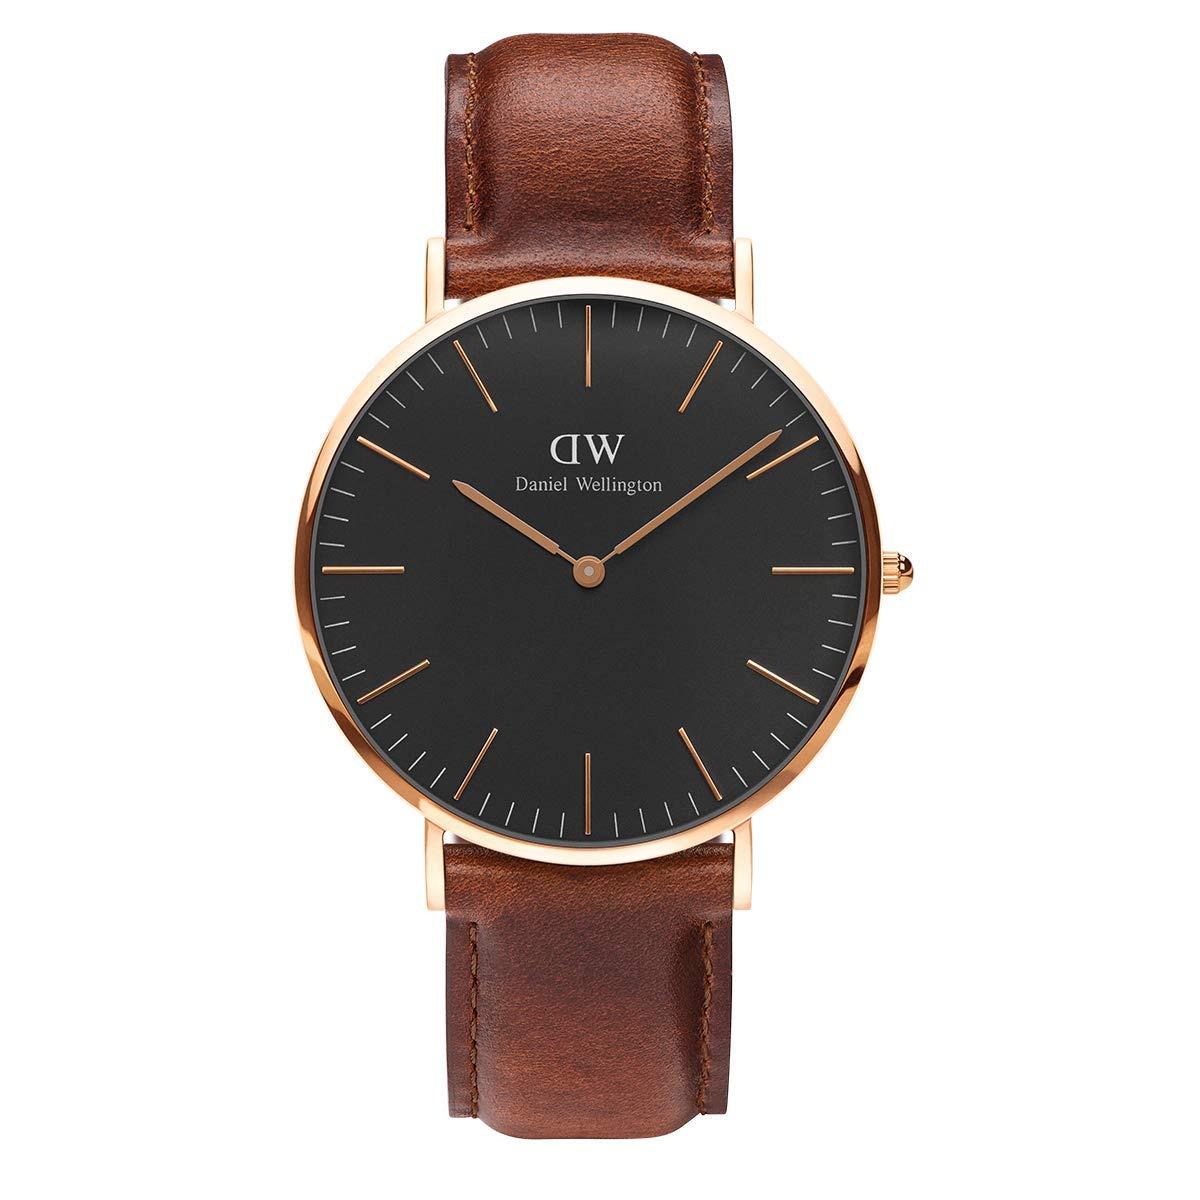 Classic St Mawes, Braun/Roségold Uhr, 40mm, Leder, für Herren